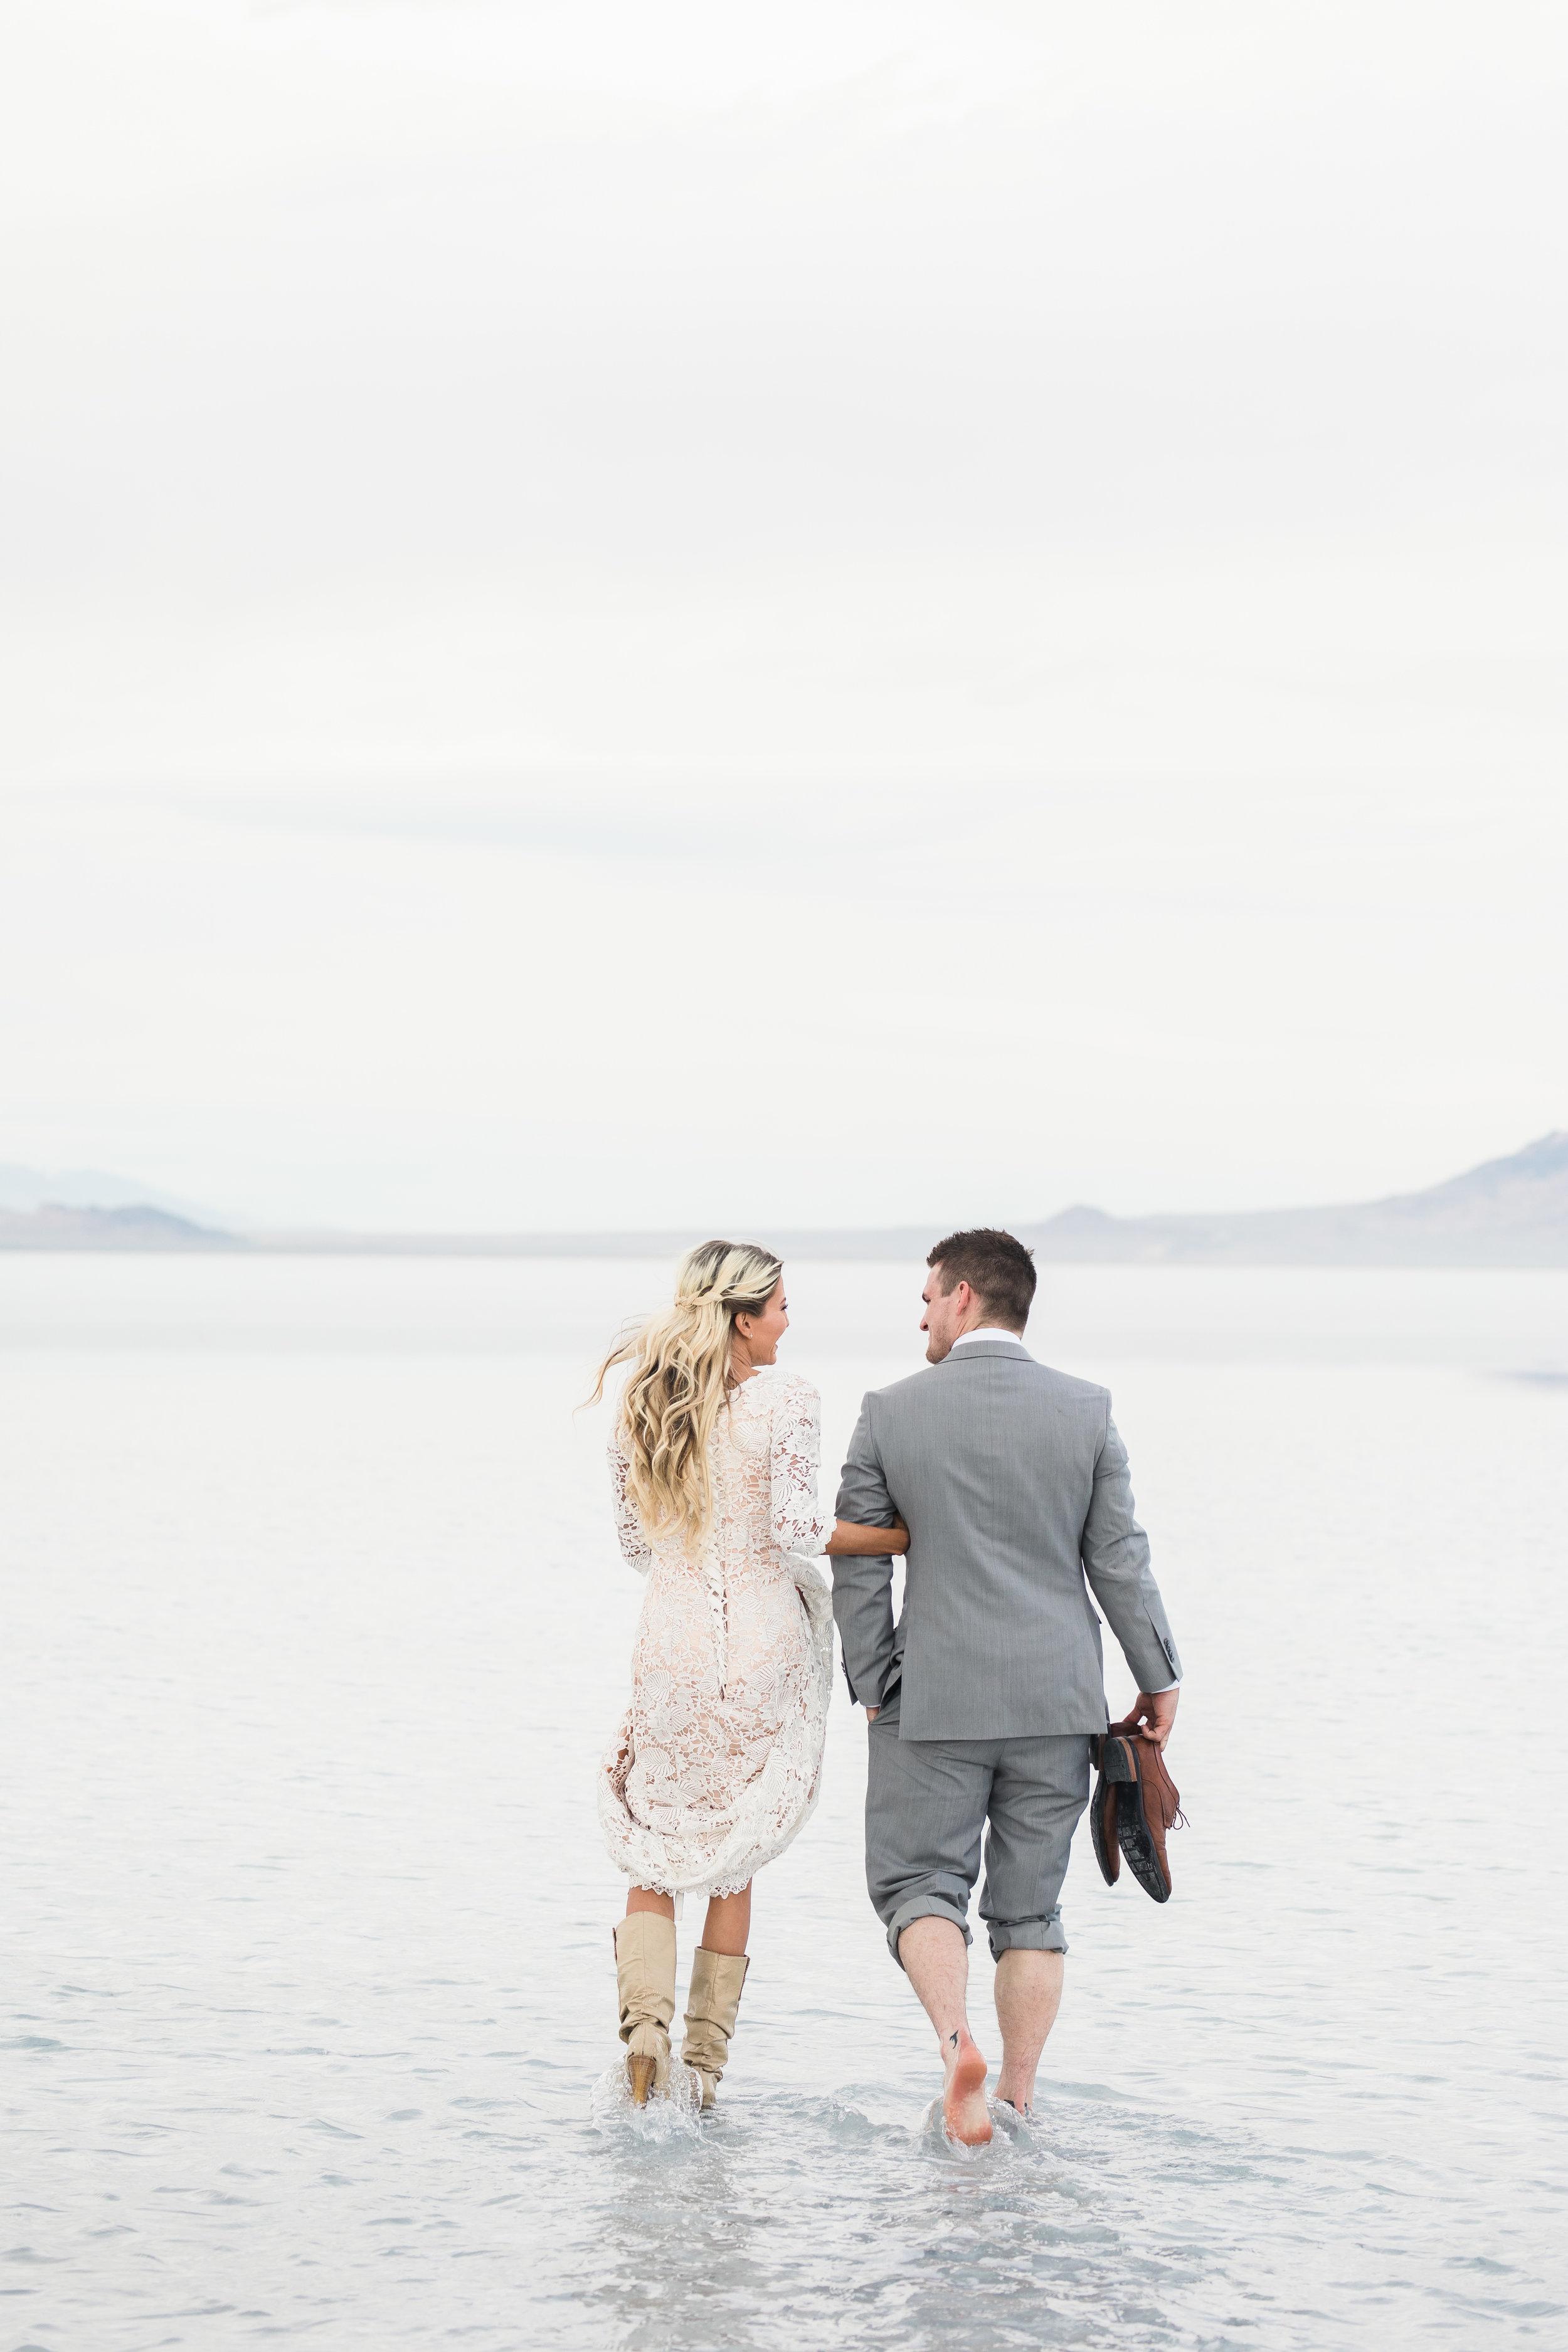 Bride and groom walking through water Bonneville Salt Flats Utah bridals